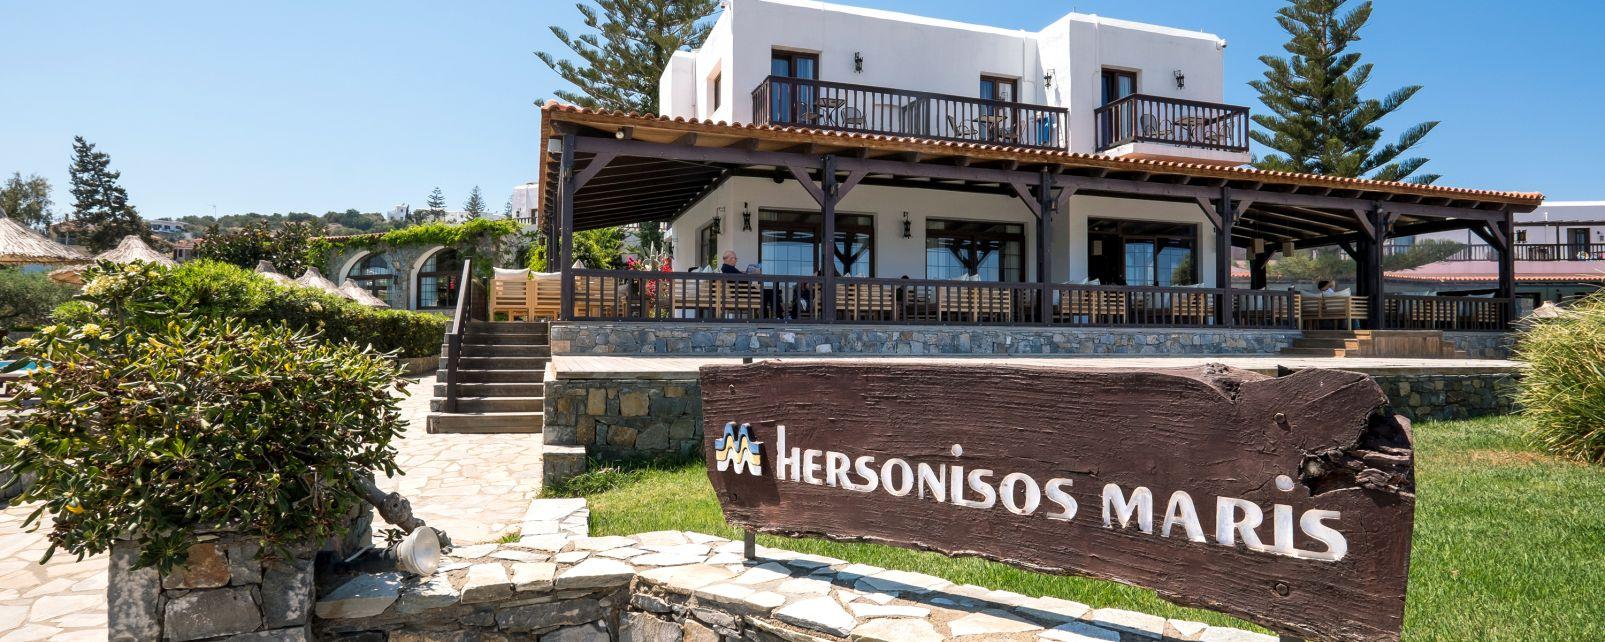 Hôtel Hersonissos Maris